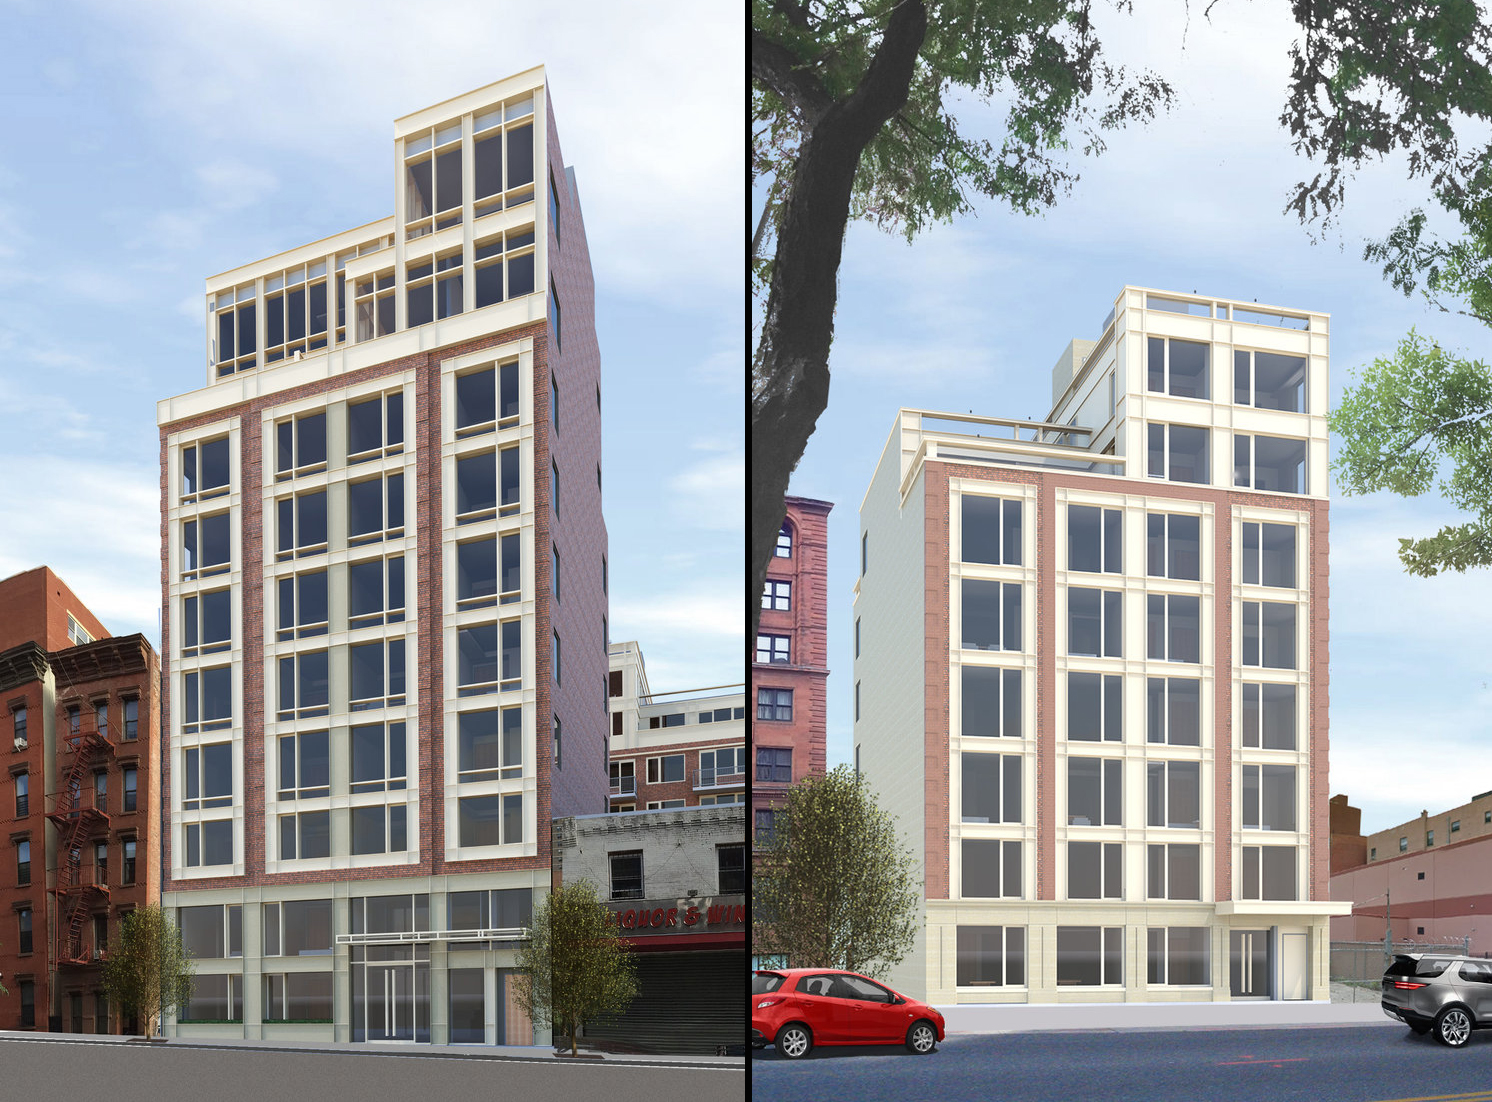 305 West 128th Street/304 West 129th Street, image via Kutnicki Bernstein Architects